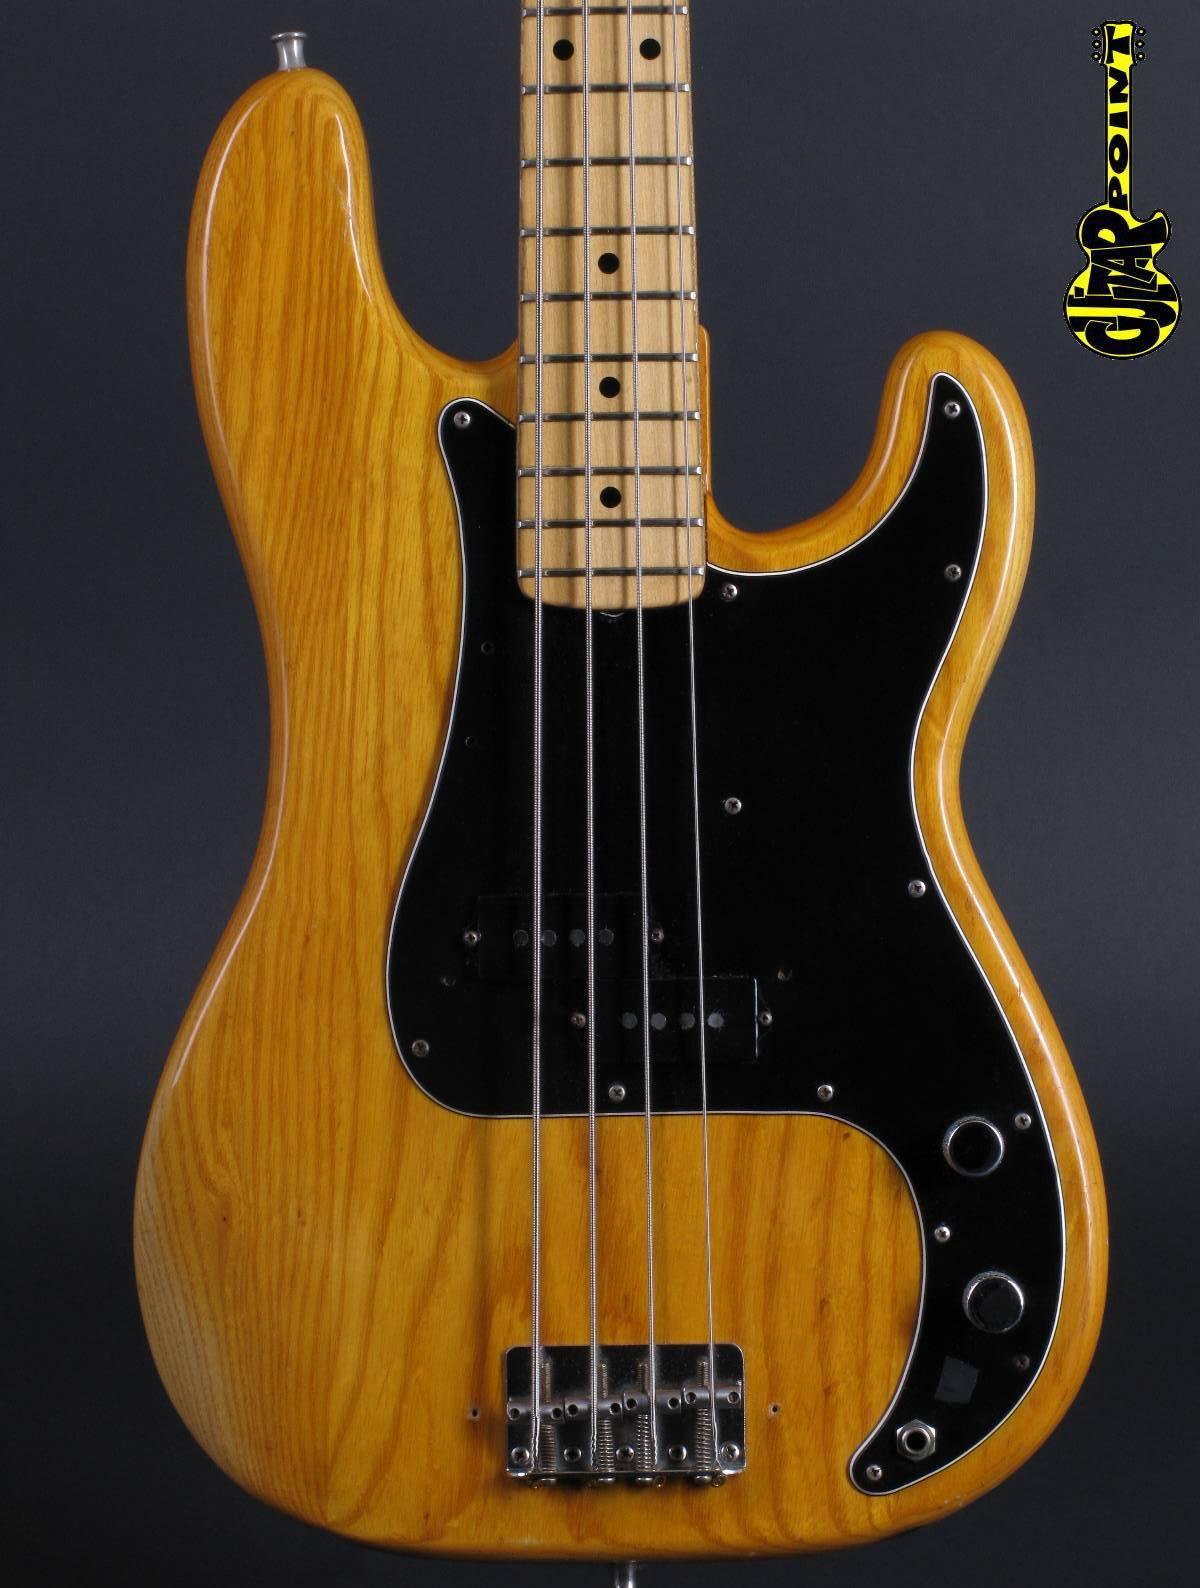 1976 Fender Precision Bass - Natural